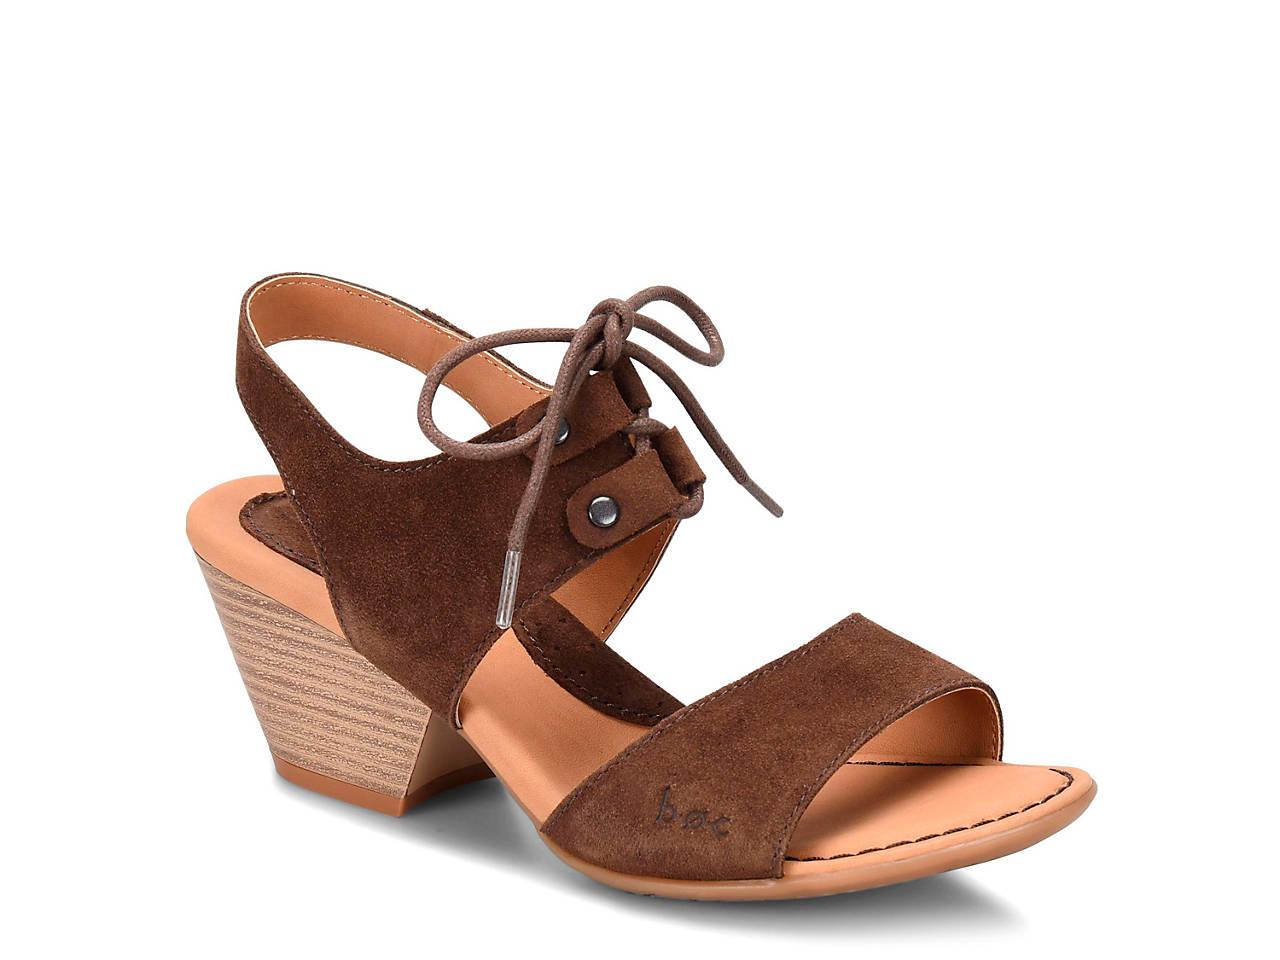 1bd977317be5 B O C Shoes Dsw - Style Guru  Fashion